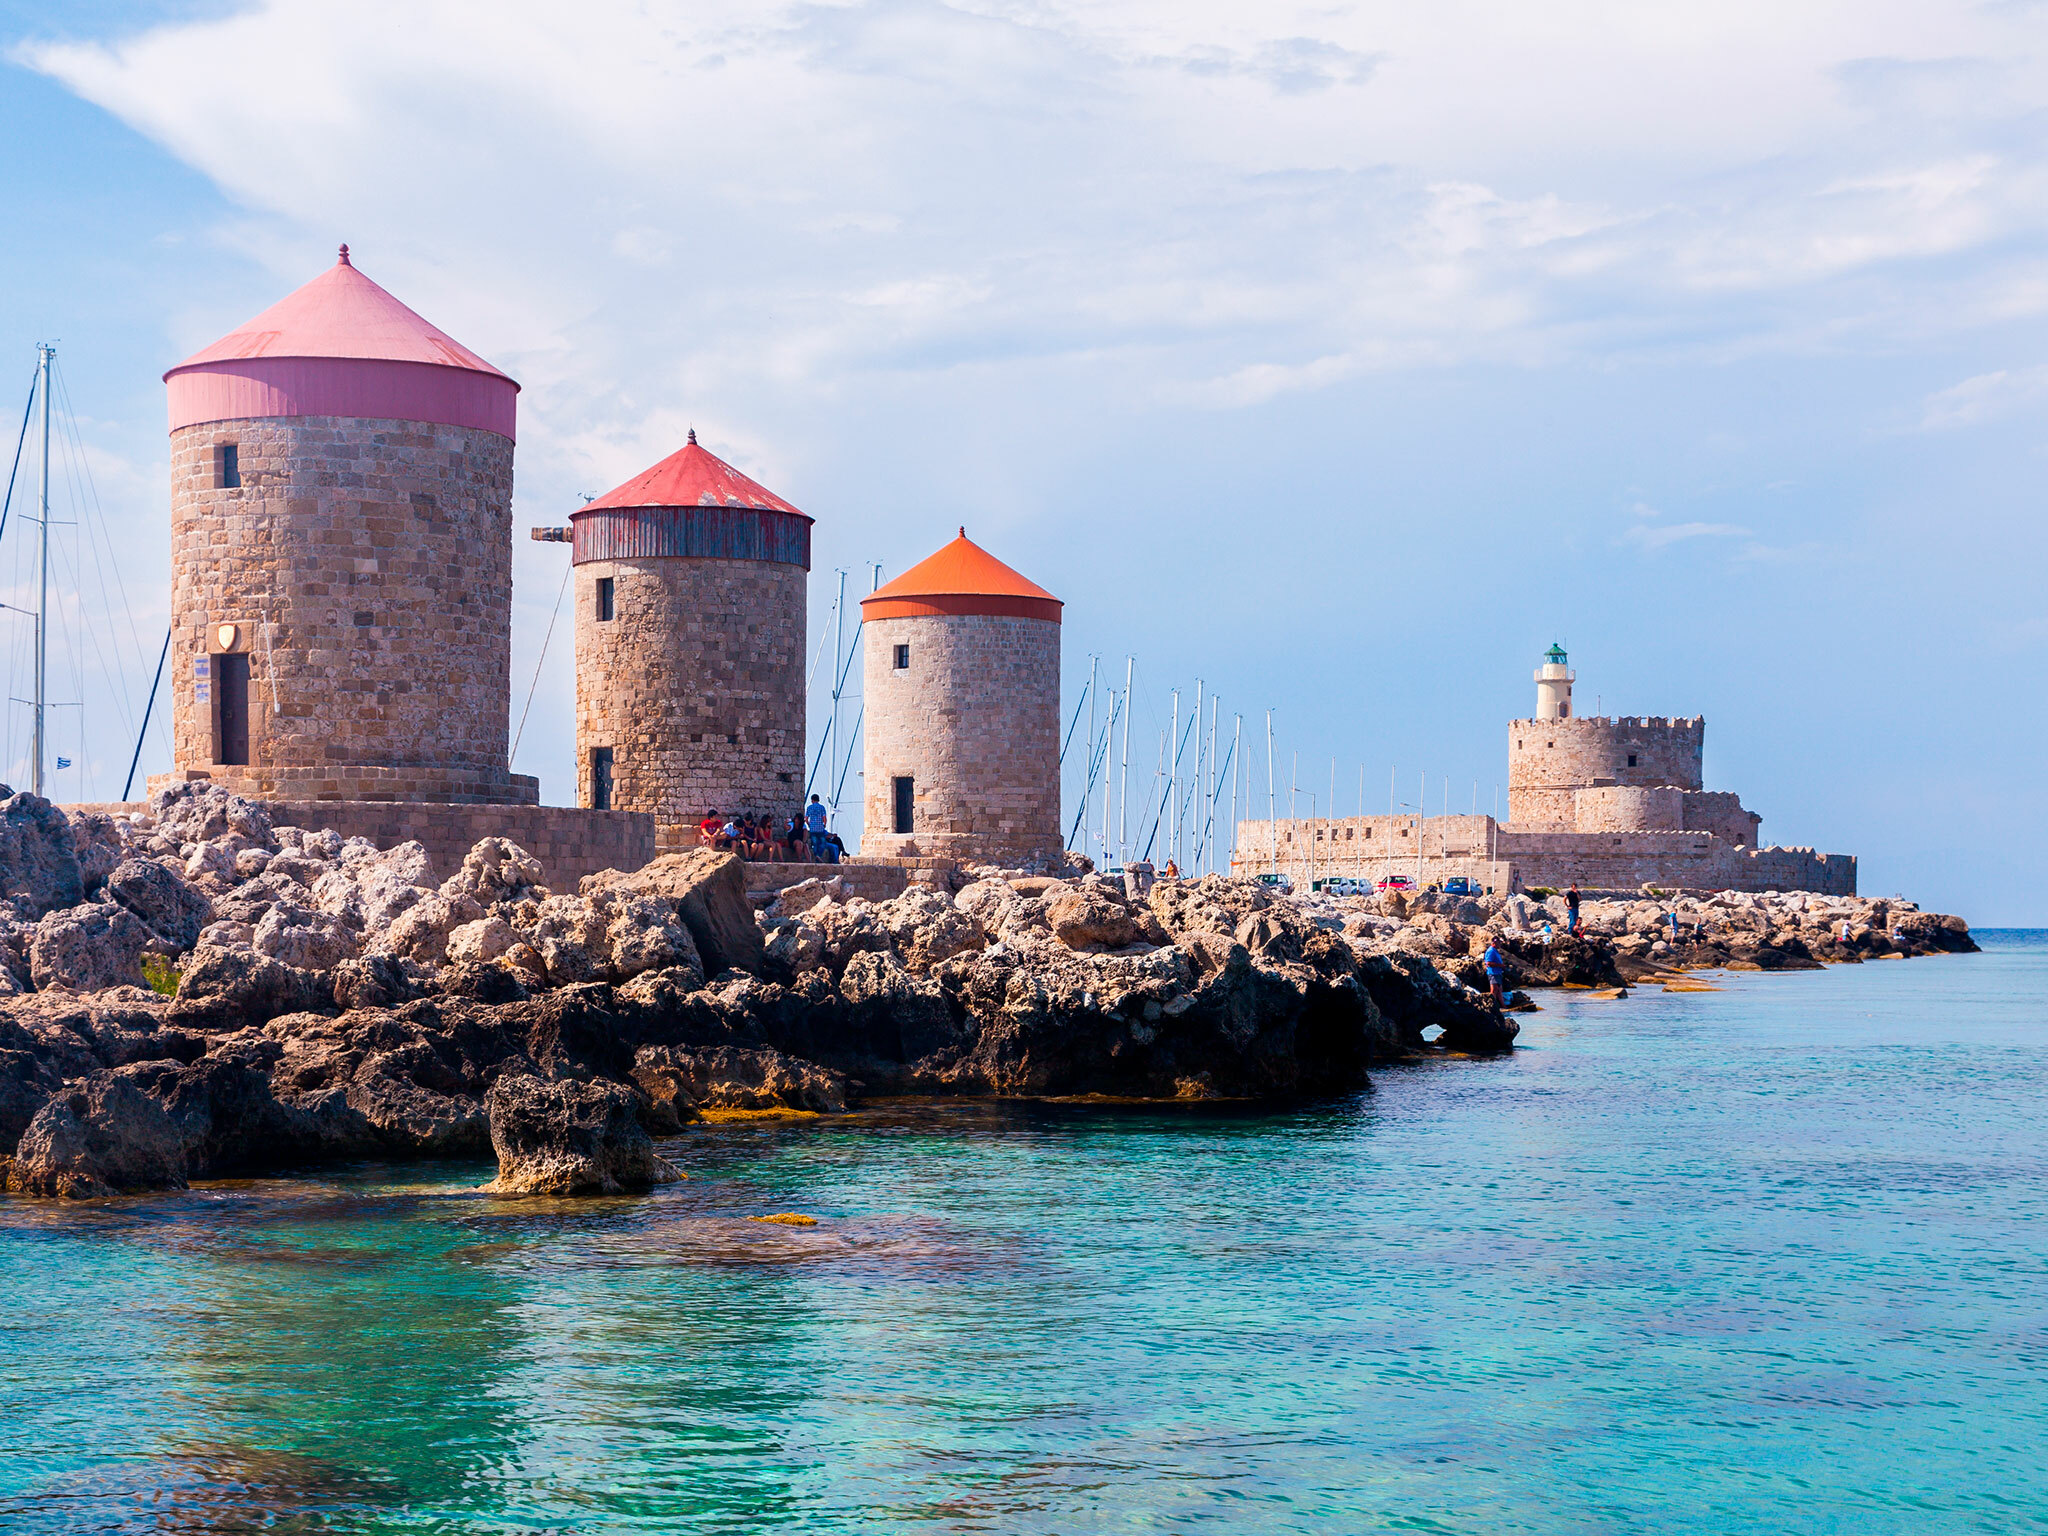 Fort of Saint Nicholas